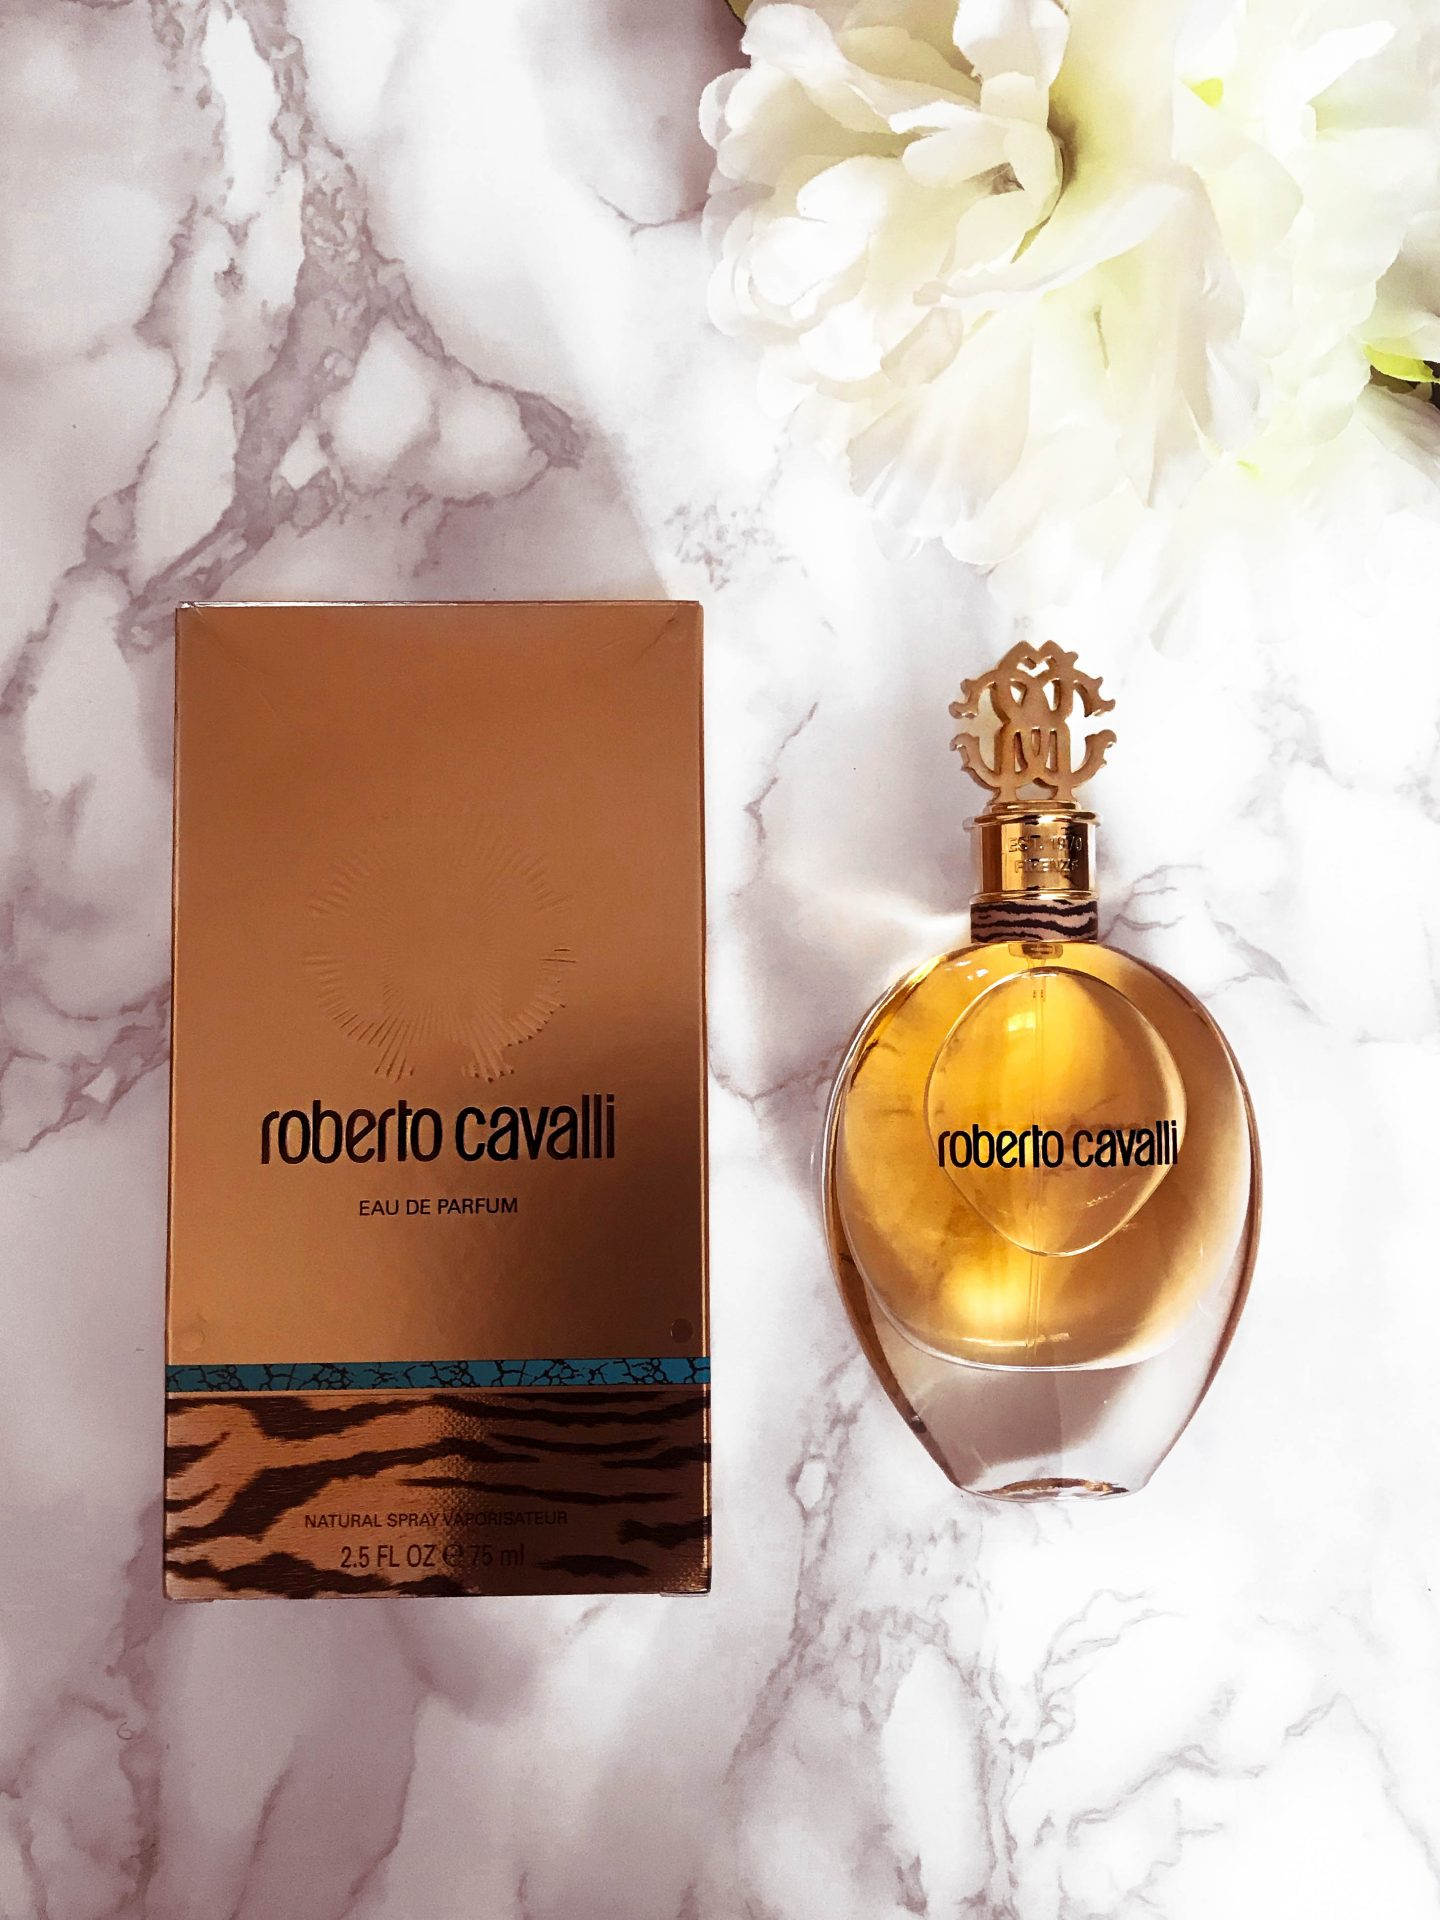 FRAGANCE OF THE MONTH- ROBERTO CAVALLI ~ EAU DE PARFUME